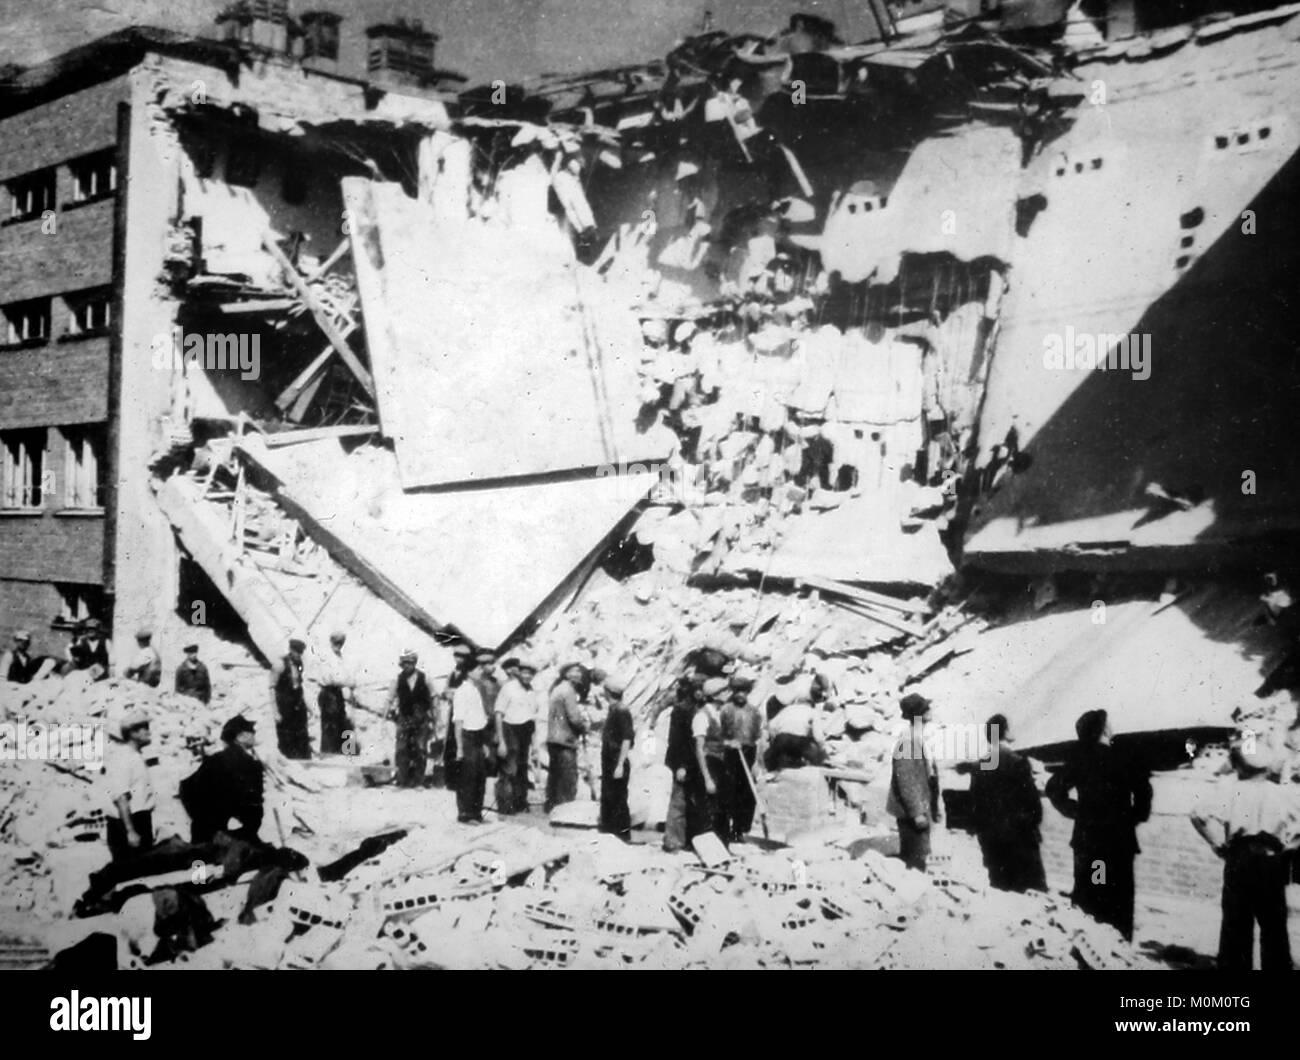 Air raid damage in Poland, WW2 - Stock Image